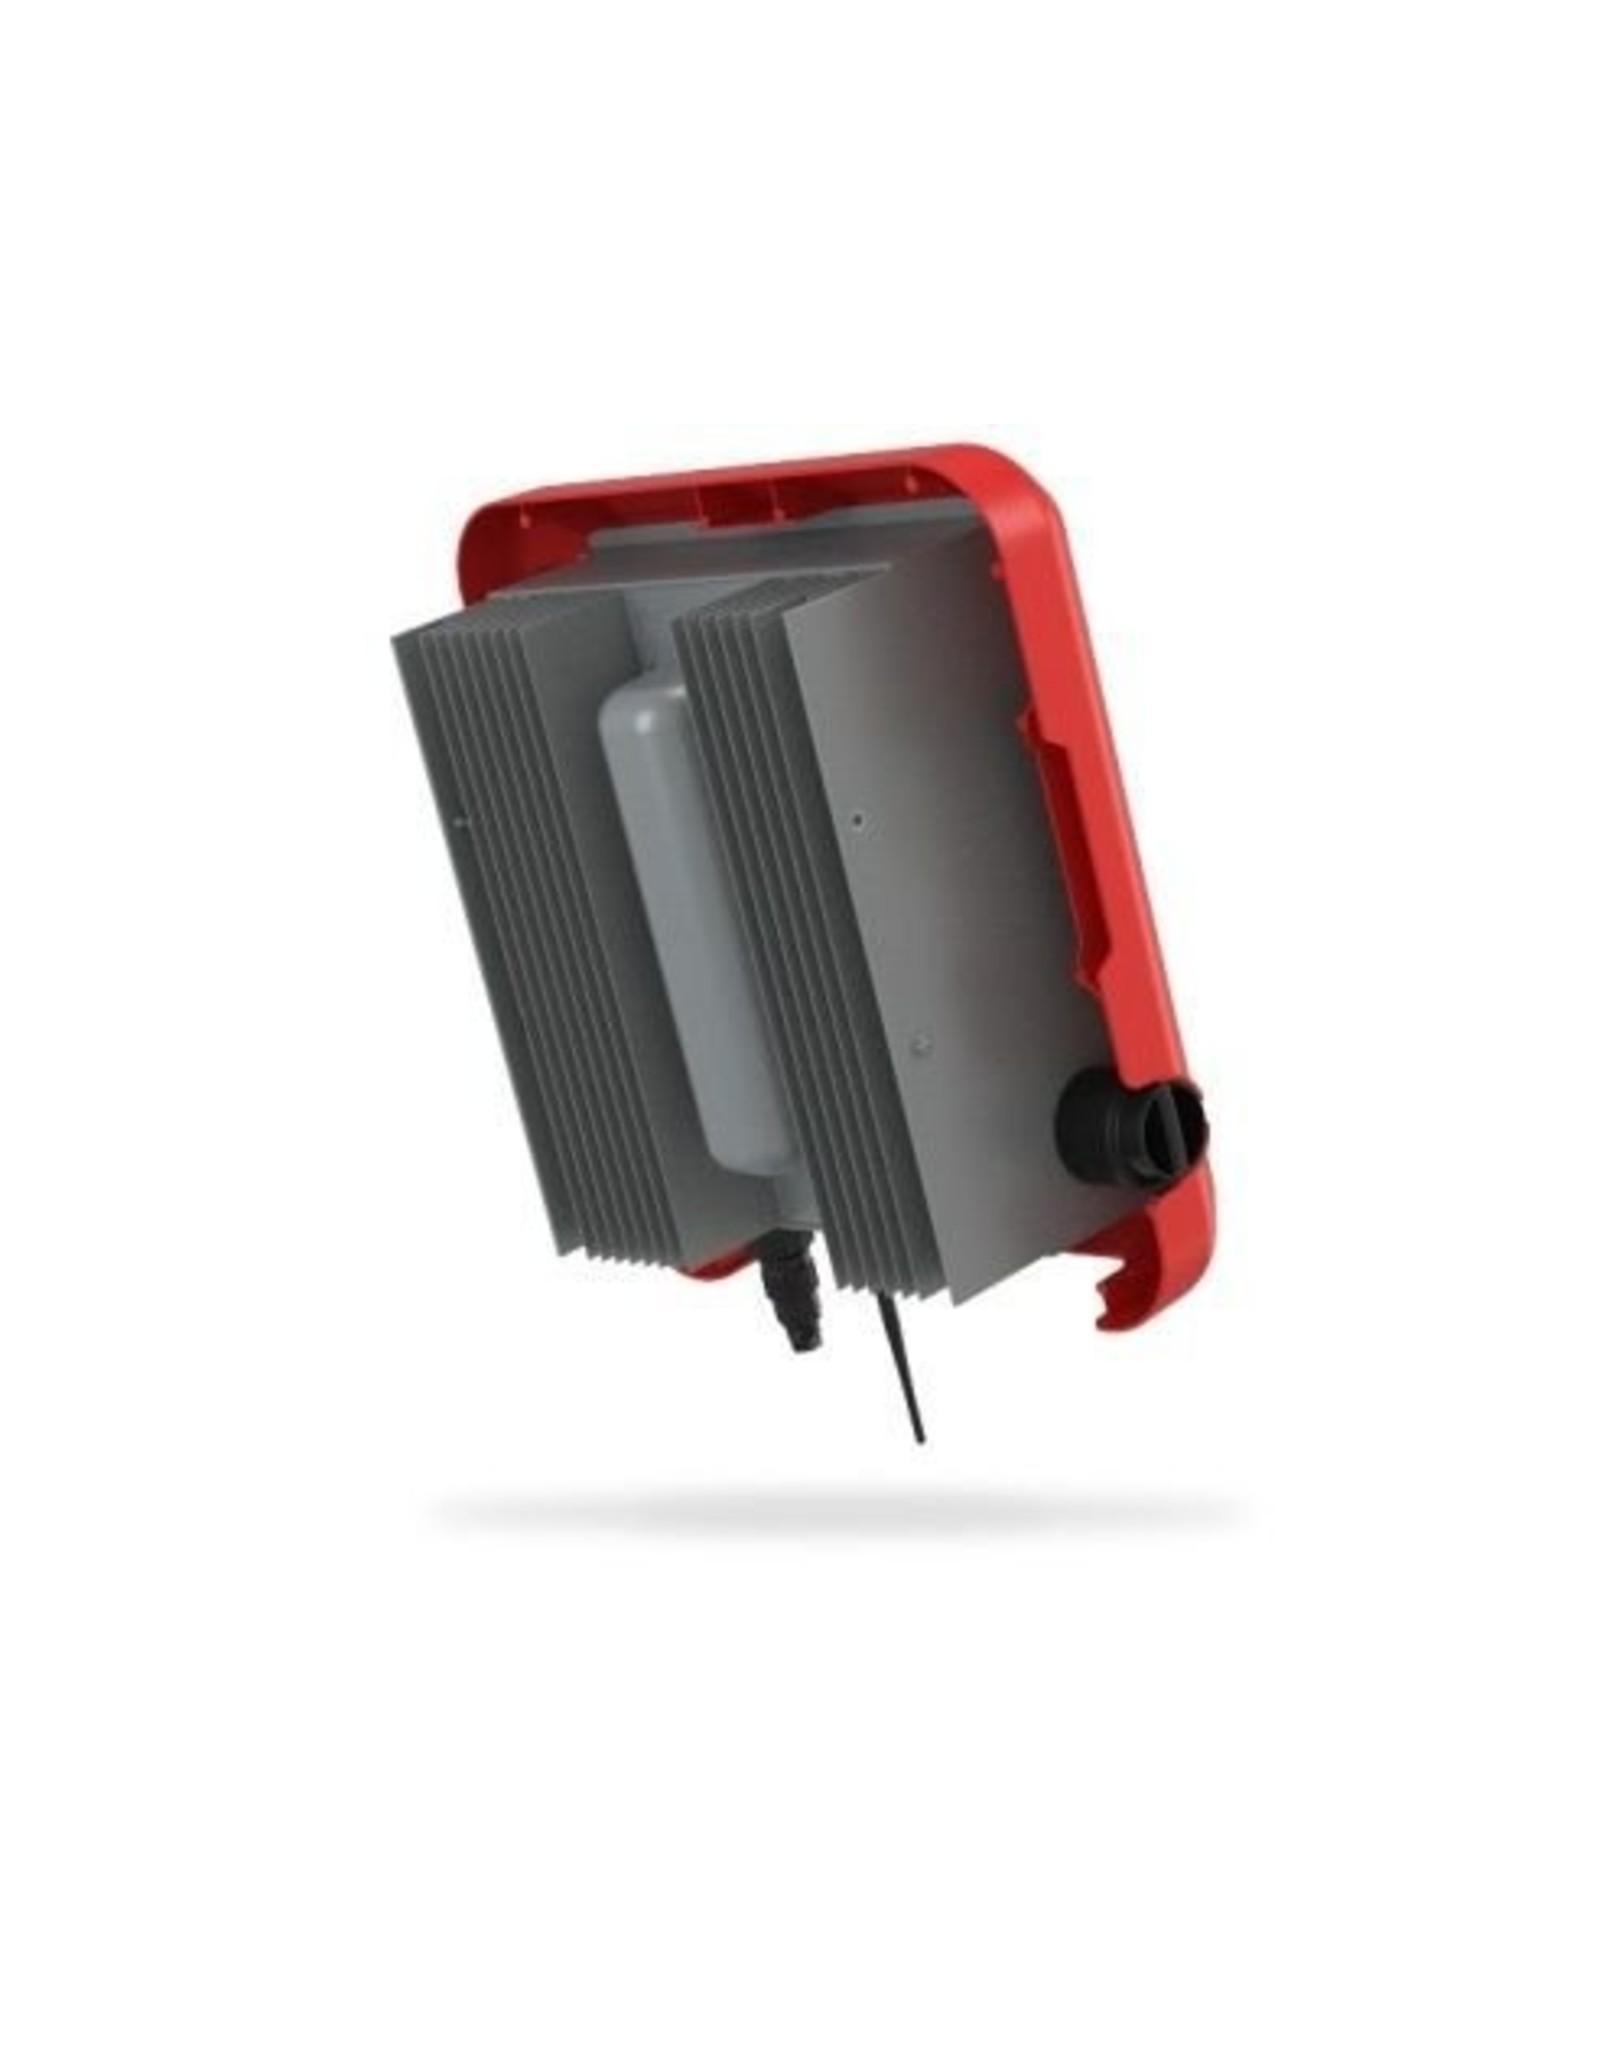 SMA SMA Sunny Boy 4.0-1AV-40 enkelfase omvormer 4.0 kW